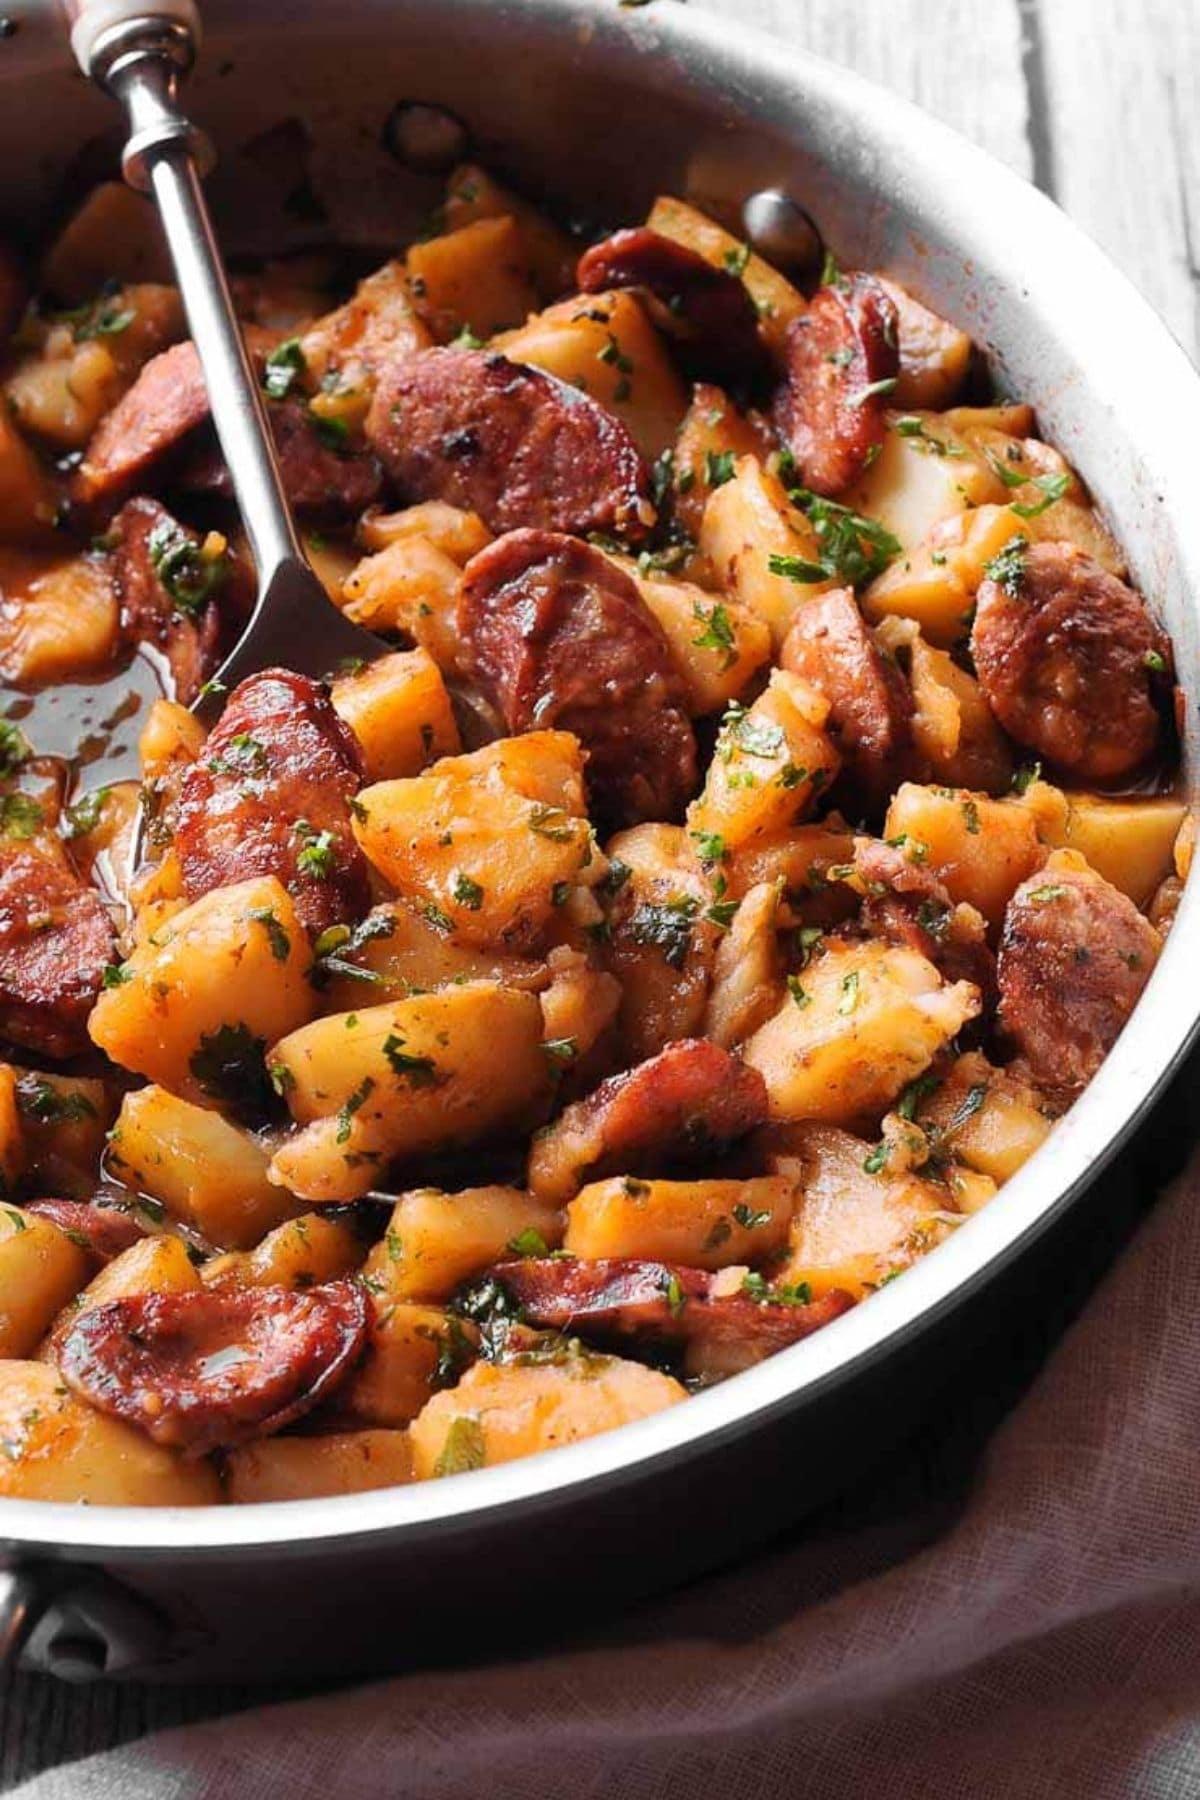 Spoon in bowl of potatoes